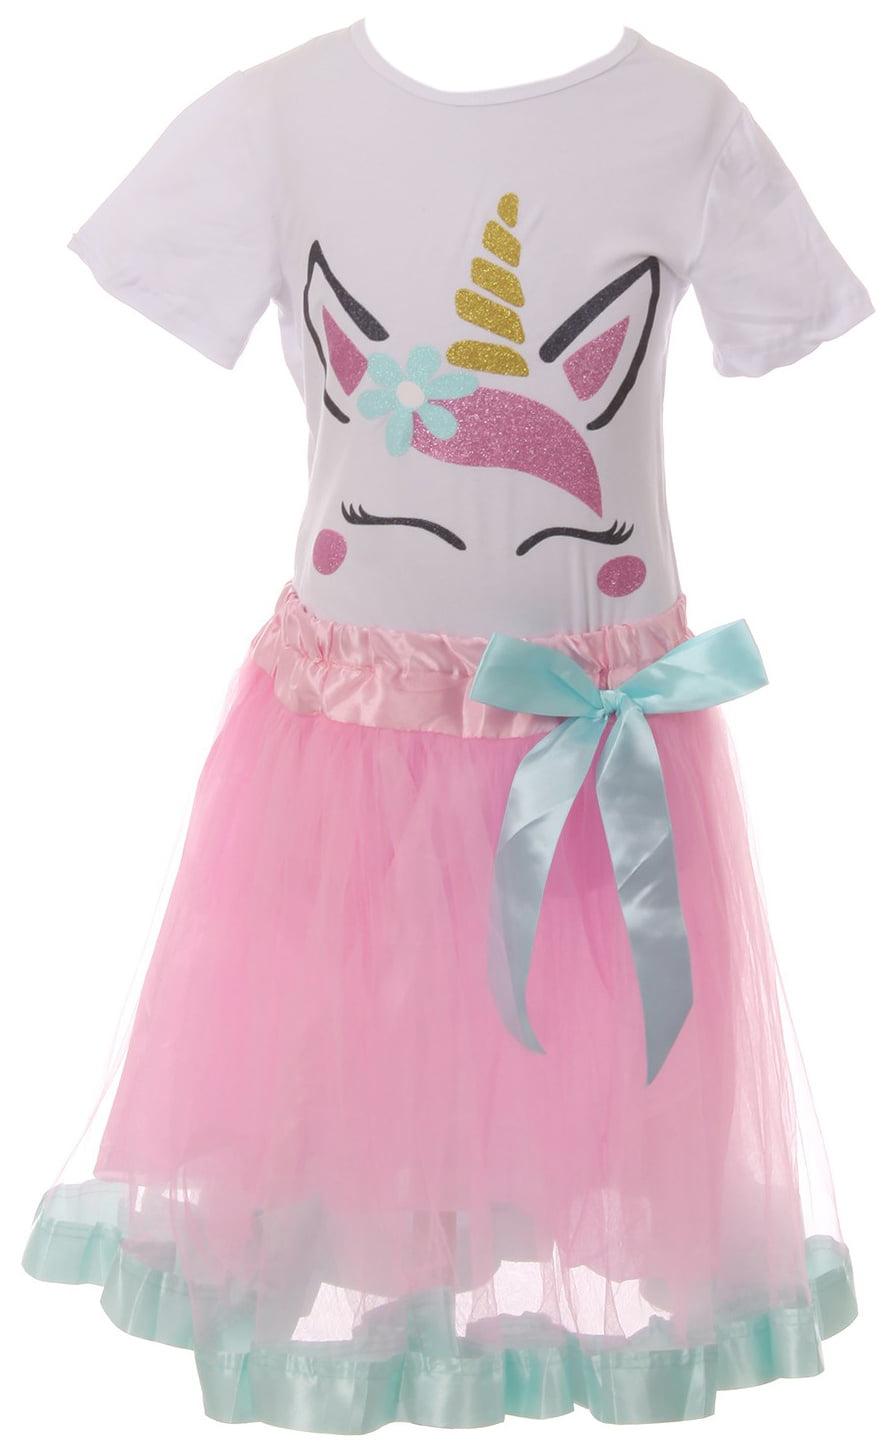 Little Girls 2 Pieces Skirt Set Holiday Party Birthday T-Shirt Top Dress Set